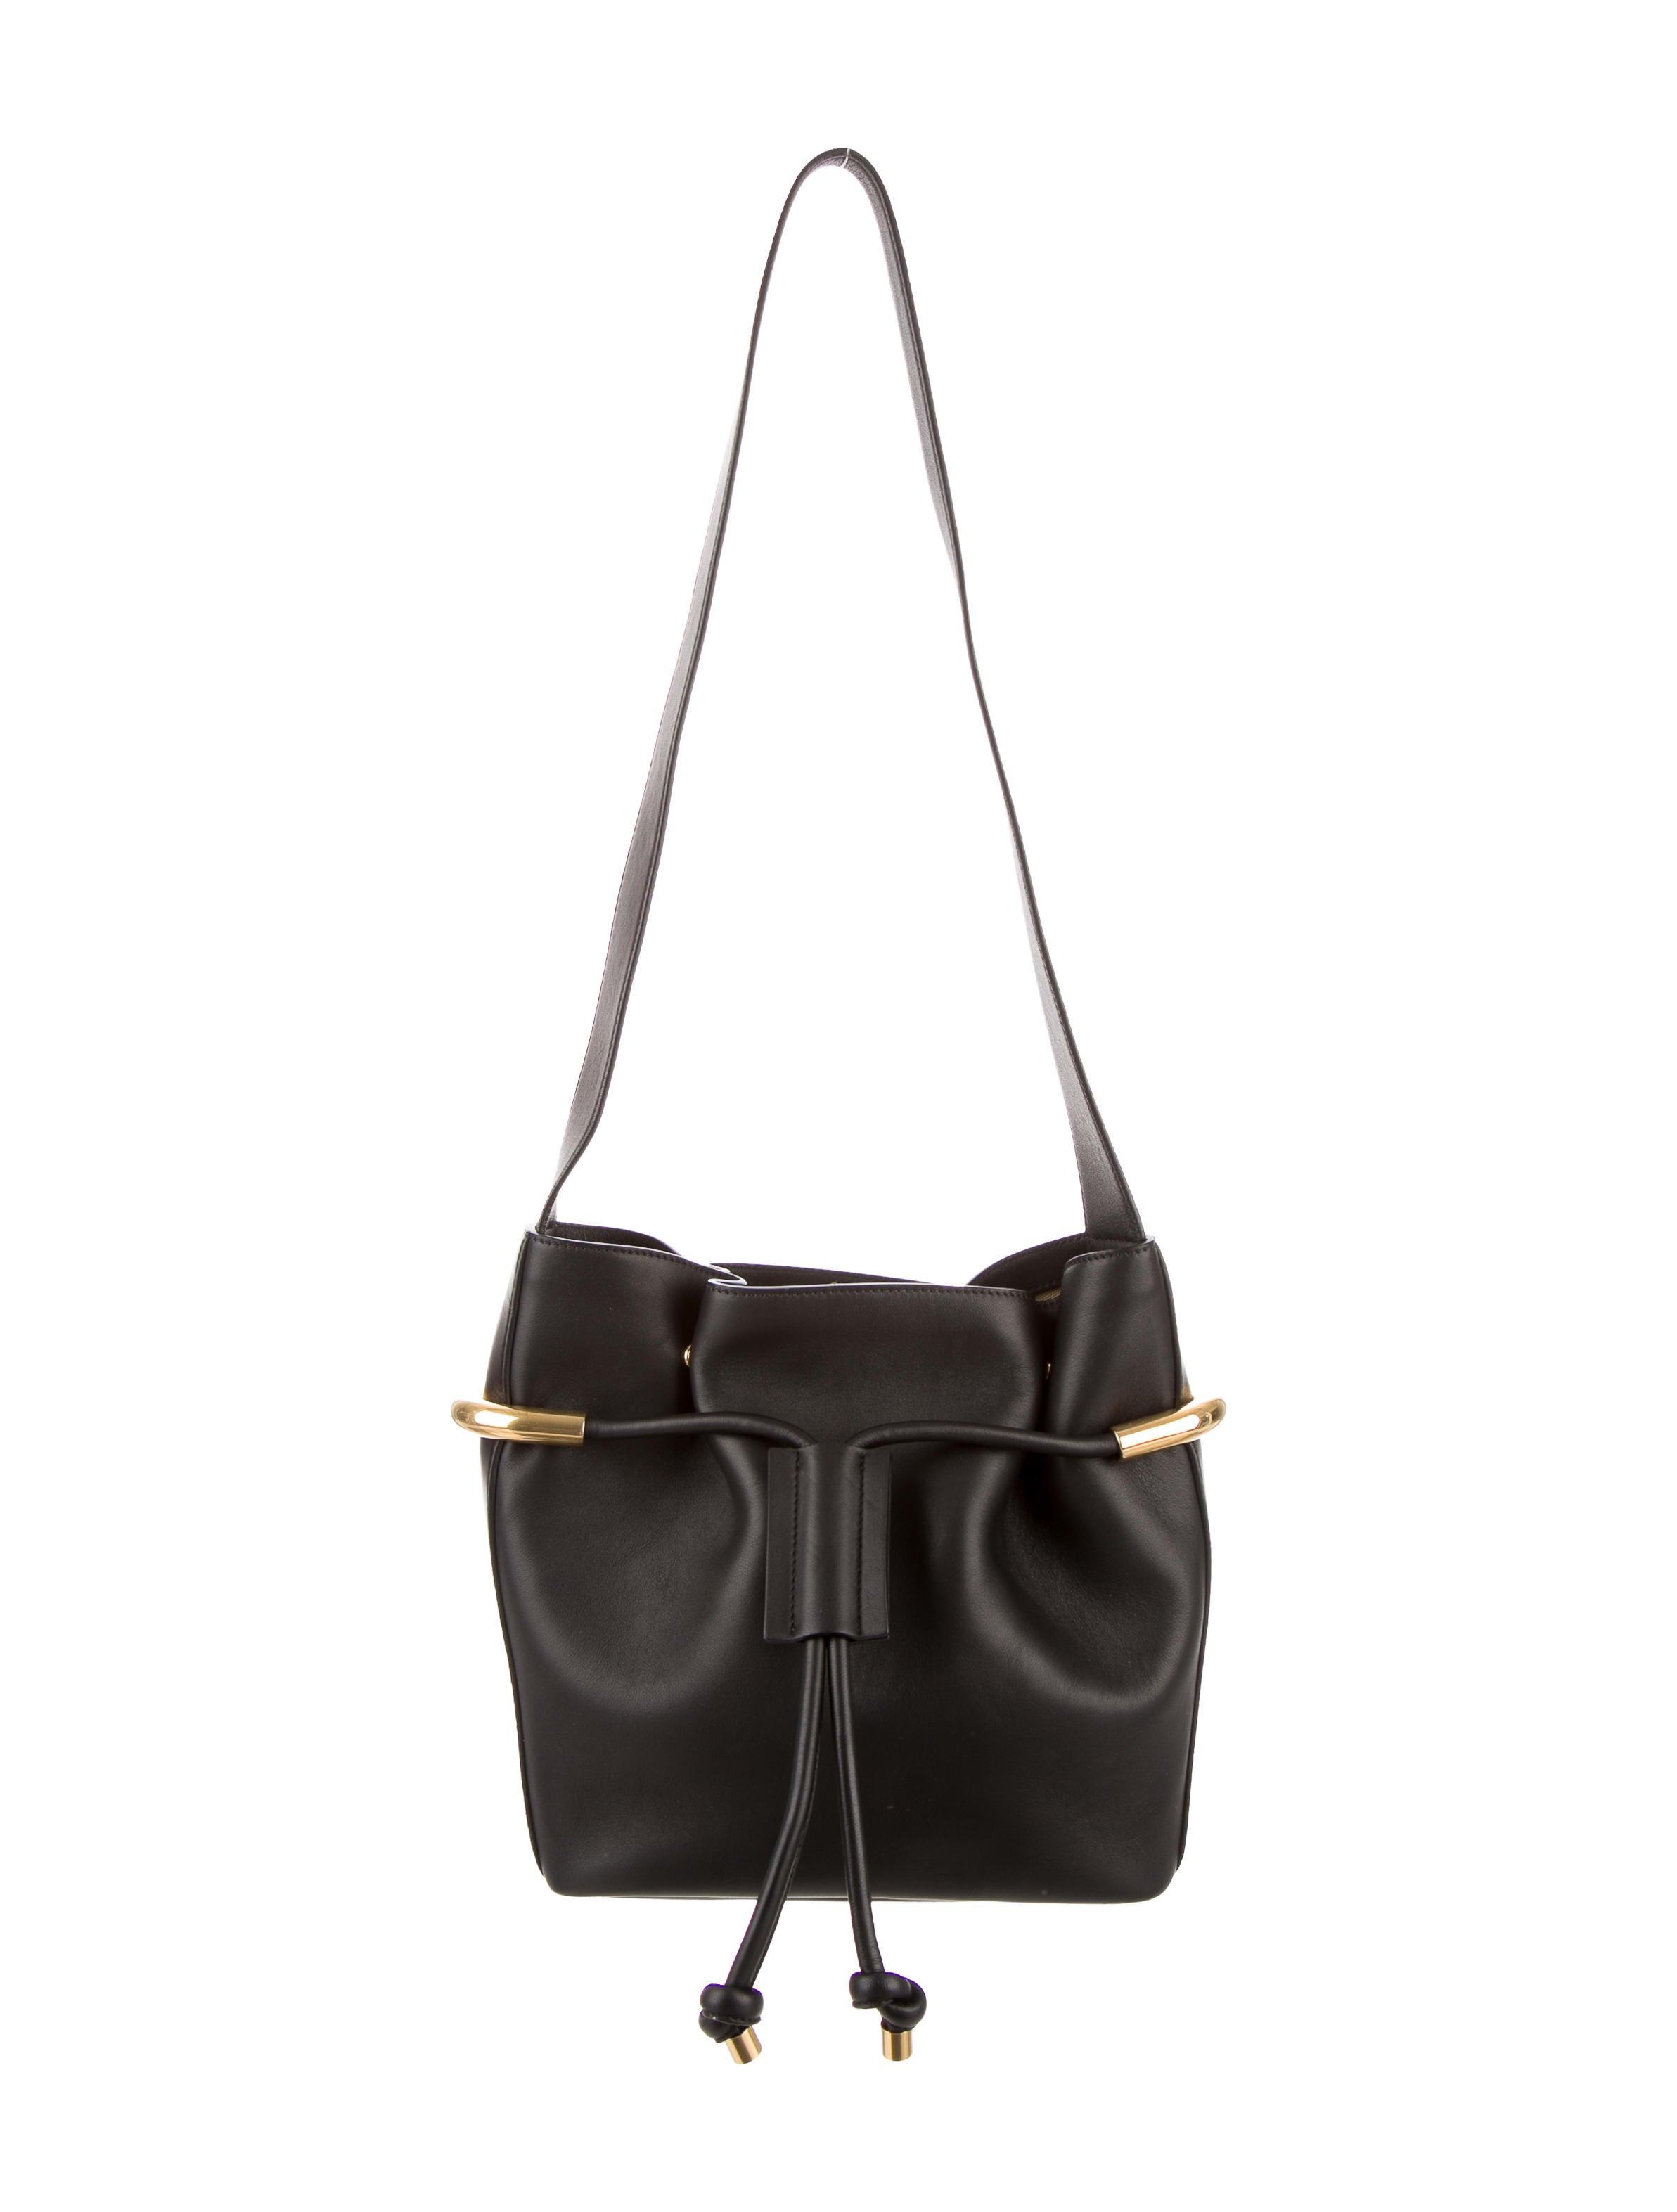 chloe python handbag - chloe small emma bucket bag w tags, chloe white leather handbag